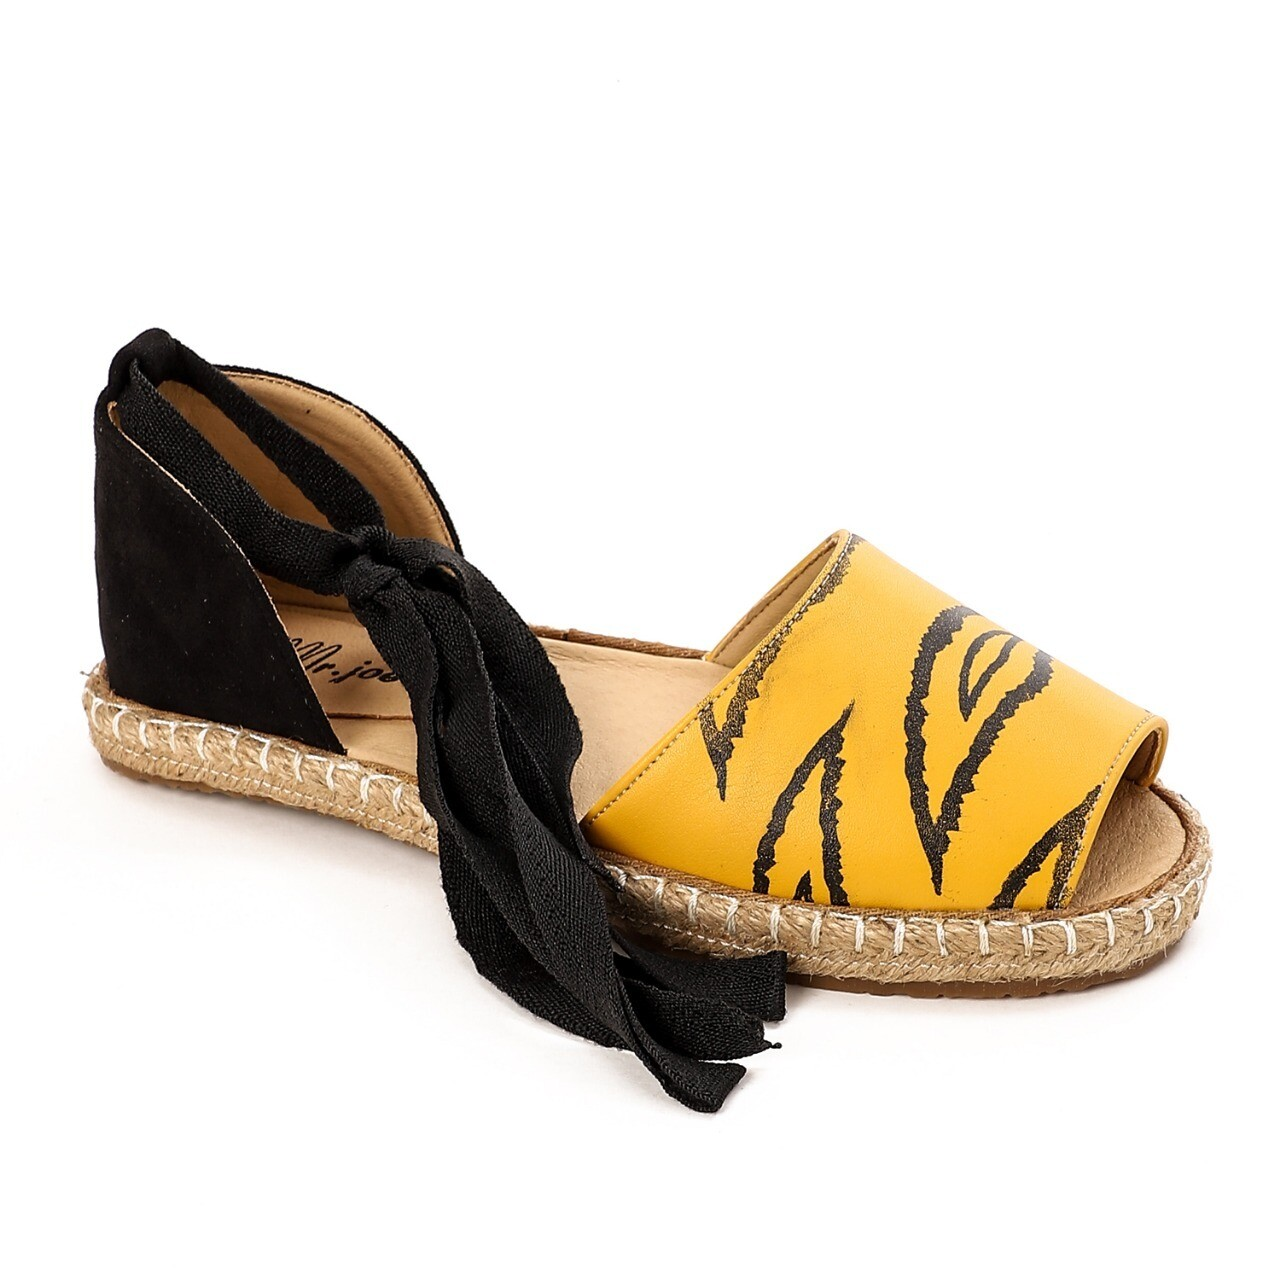 3801 Sandal - Yellow